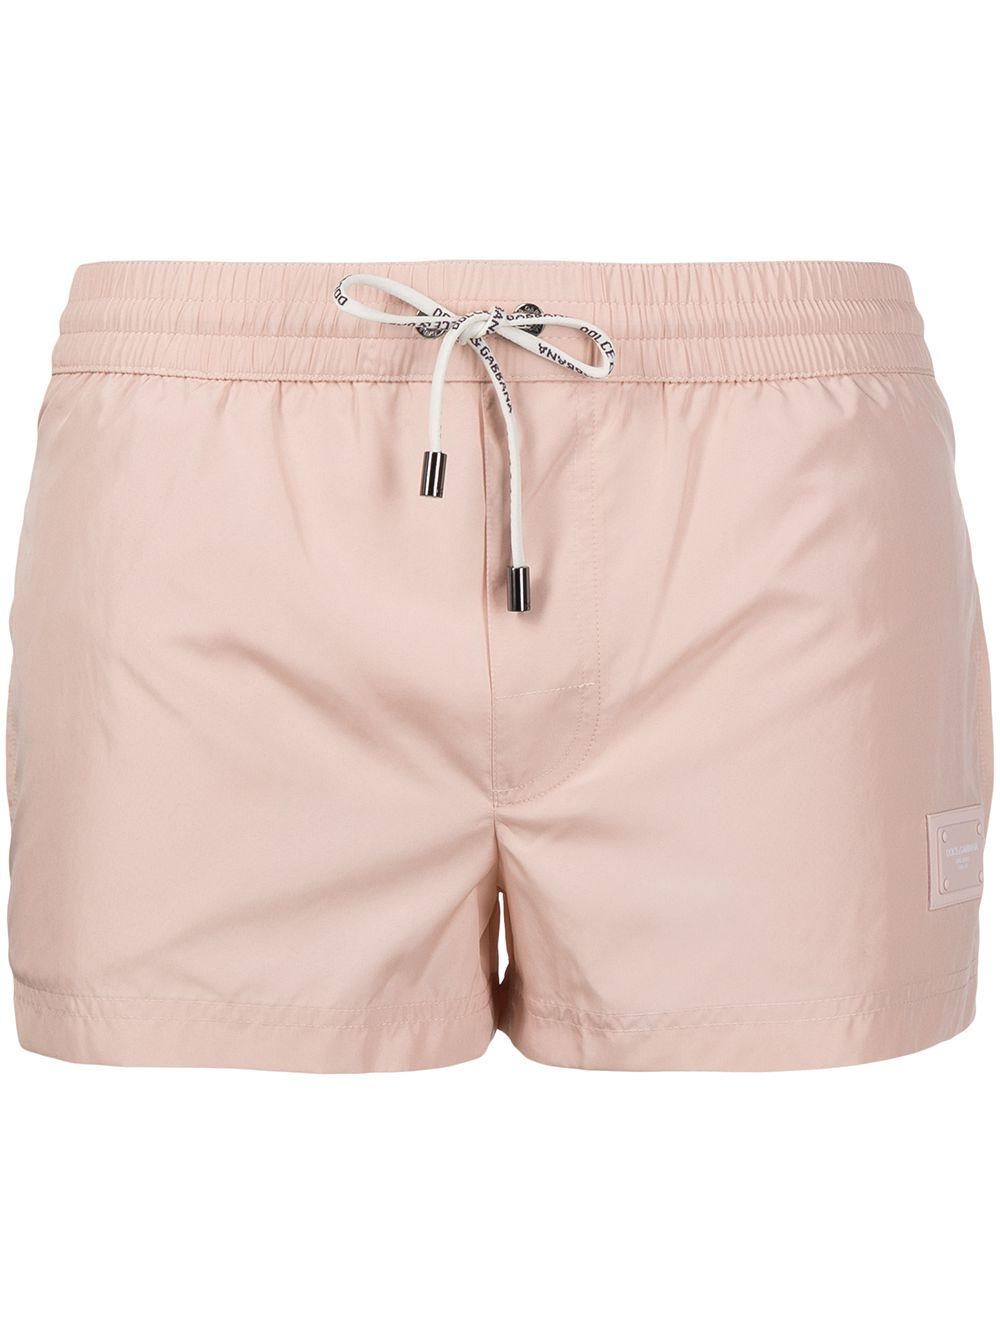 Costume da bagno rosa con logo Dolce & Gabbana DOLCE & GABBANA | Costumi | M4B11T-FUSFWM0121